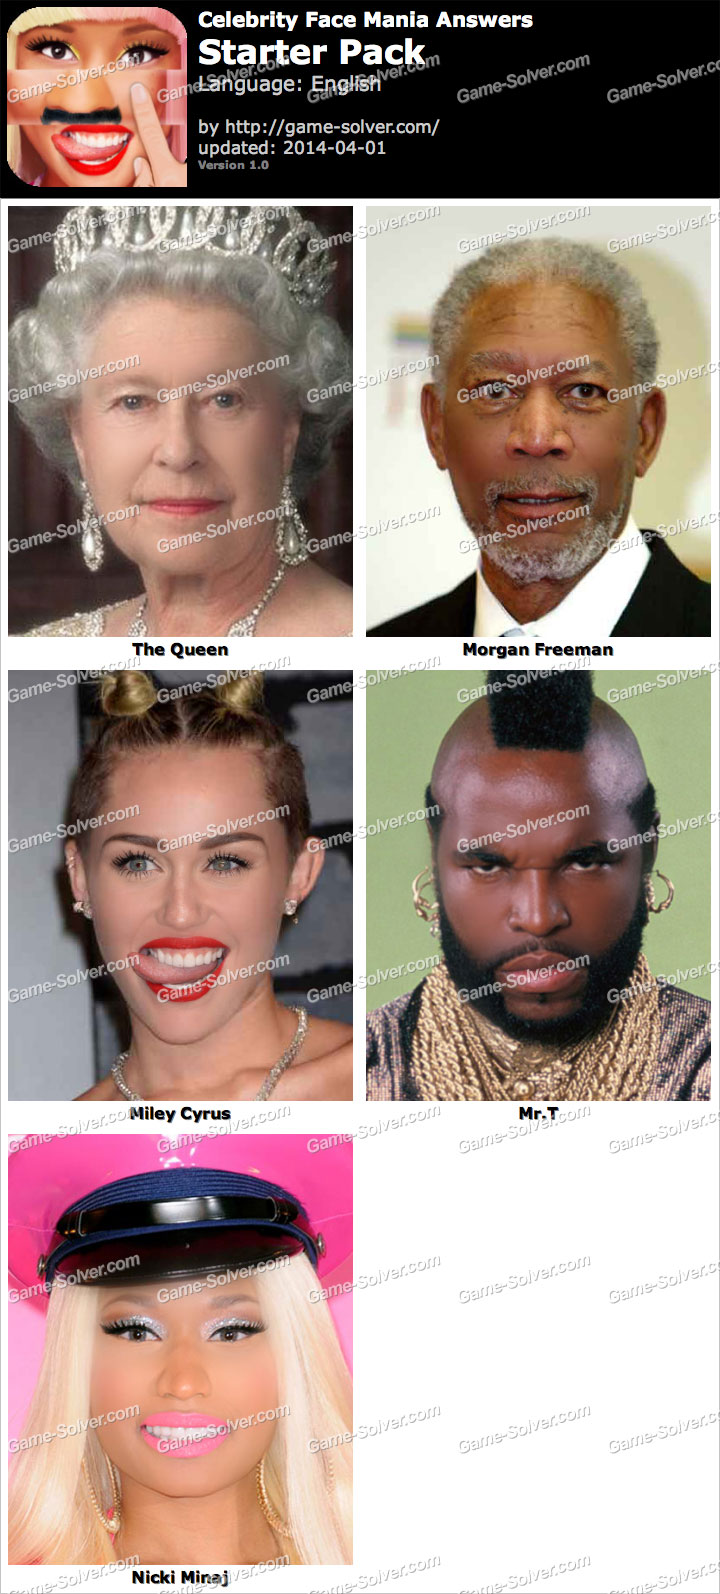 Celebrity Face Mania Starter Pack